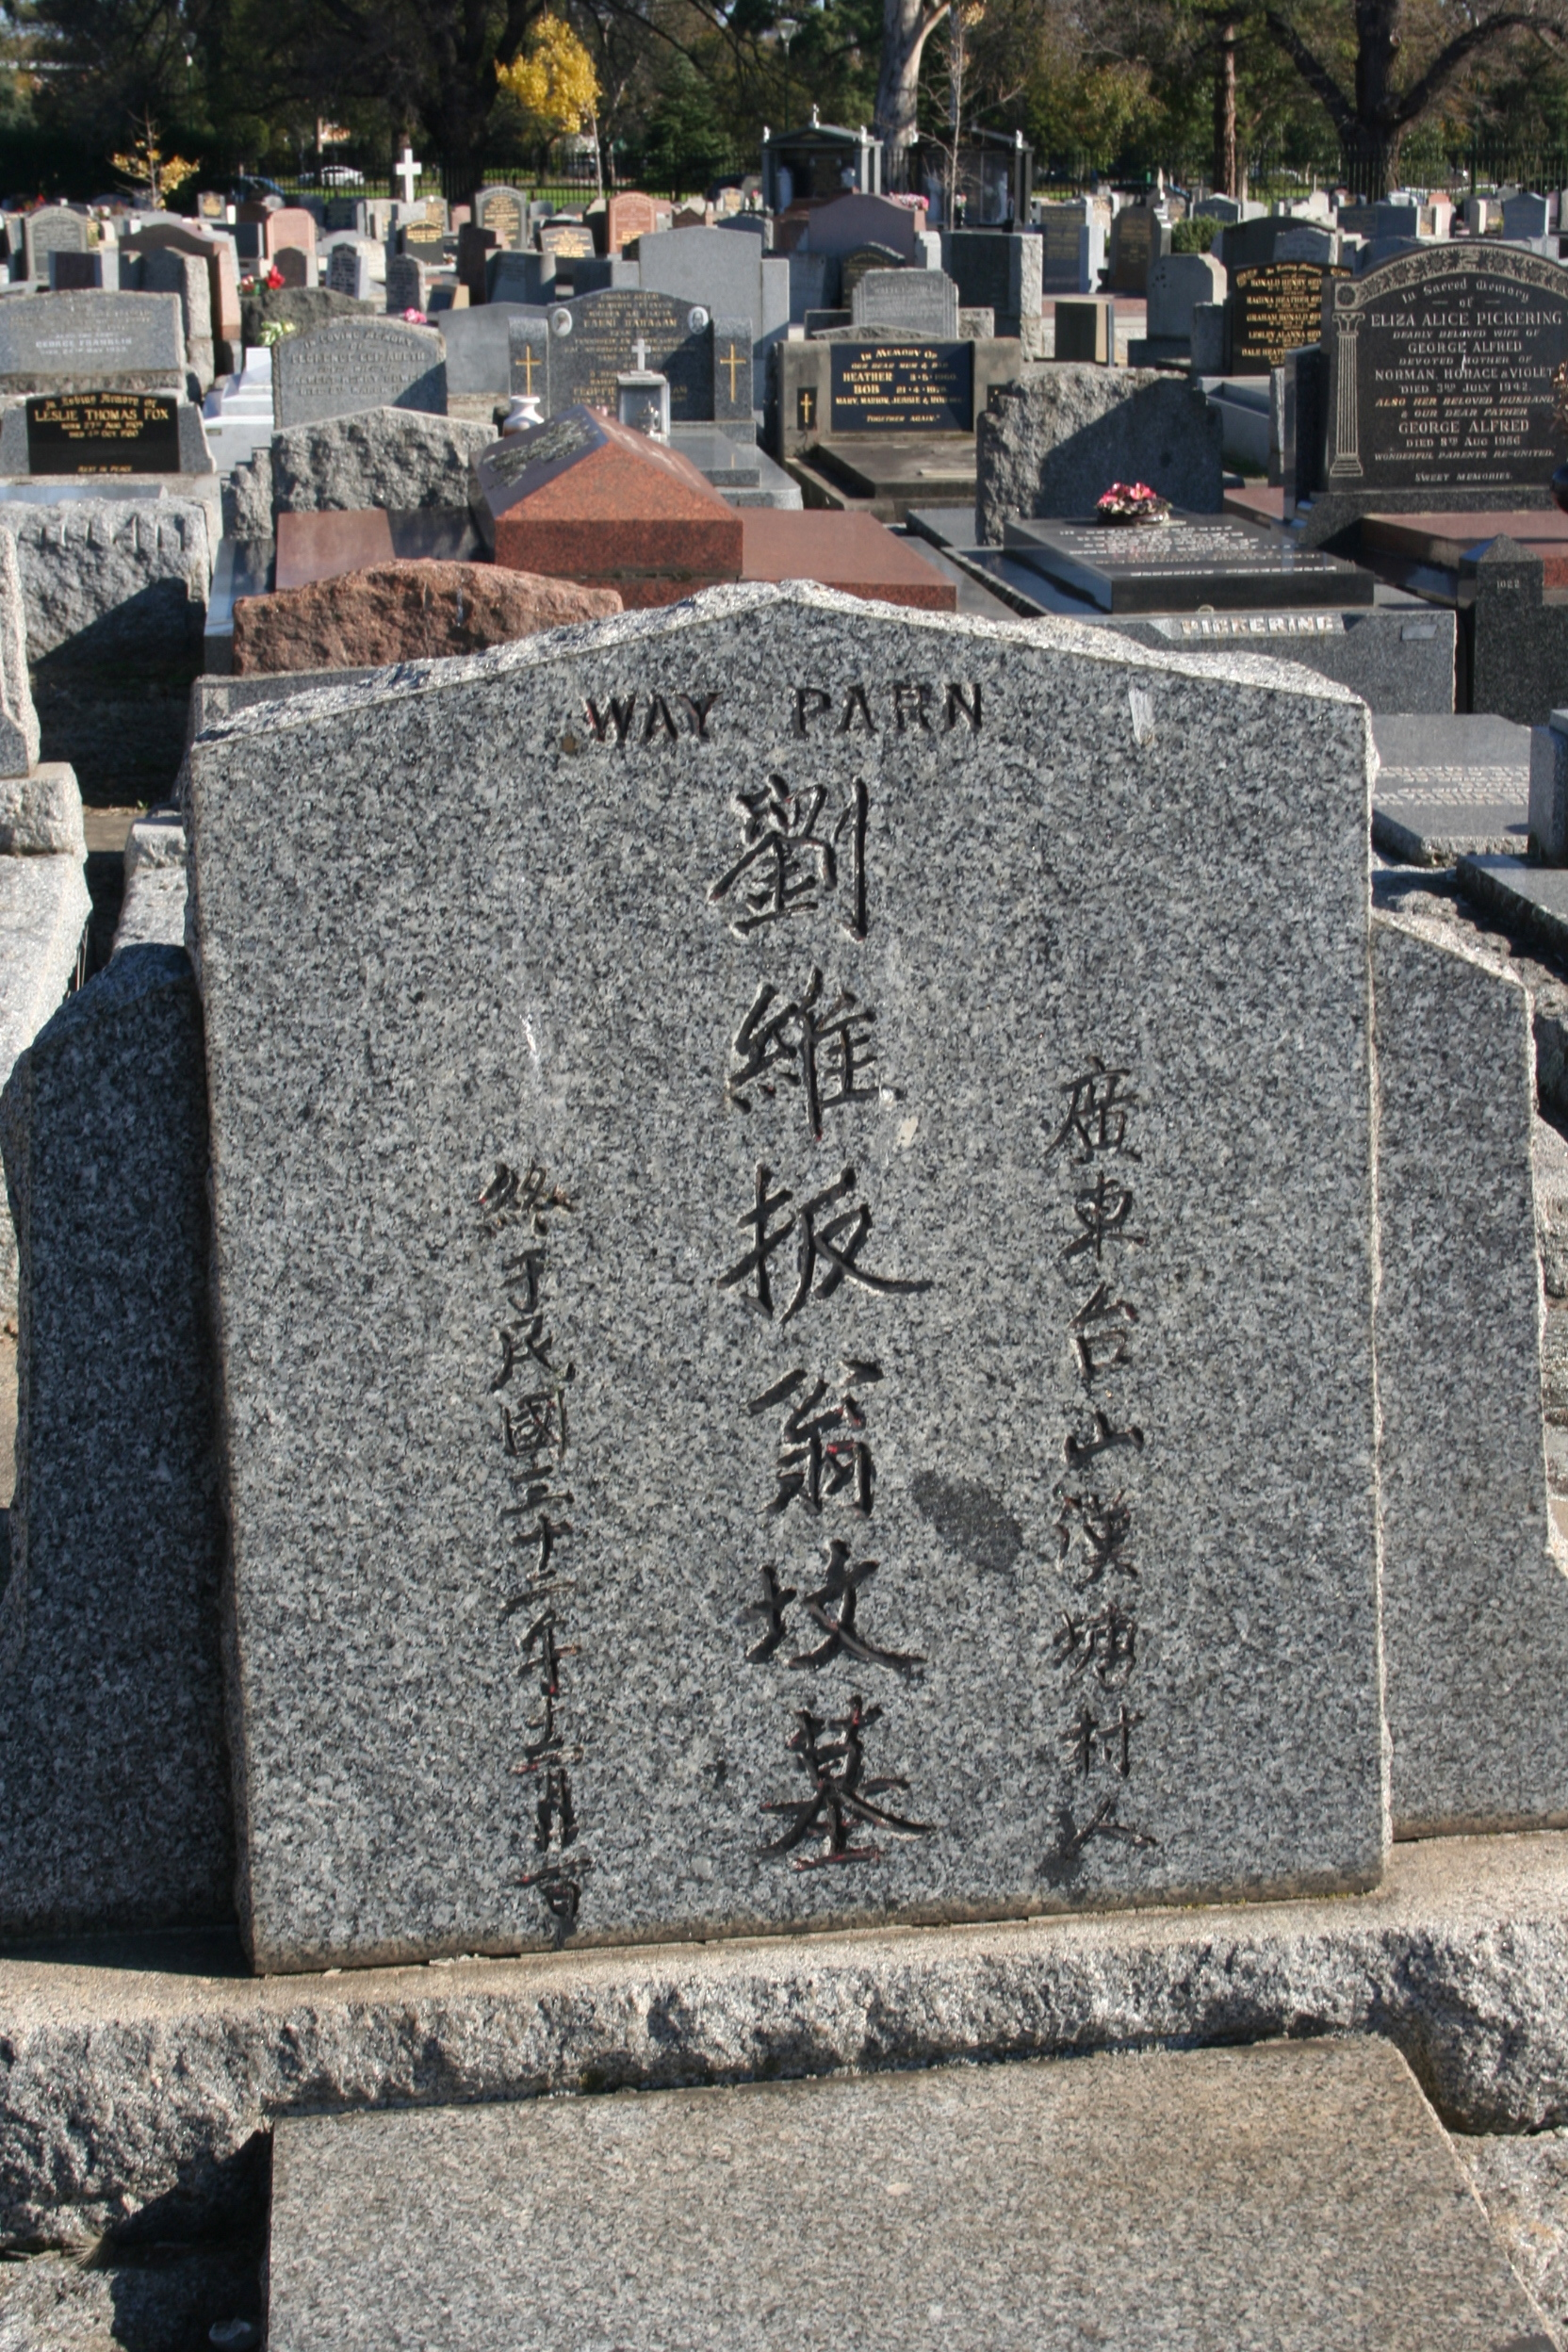 Swill cemetery photo